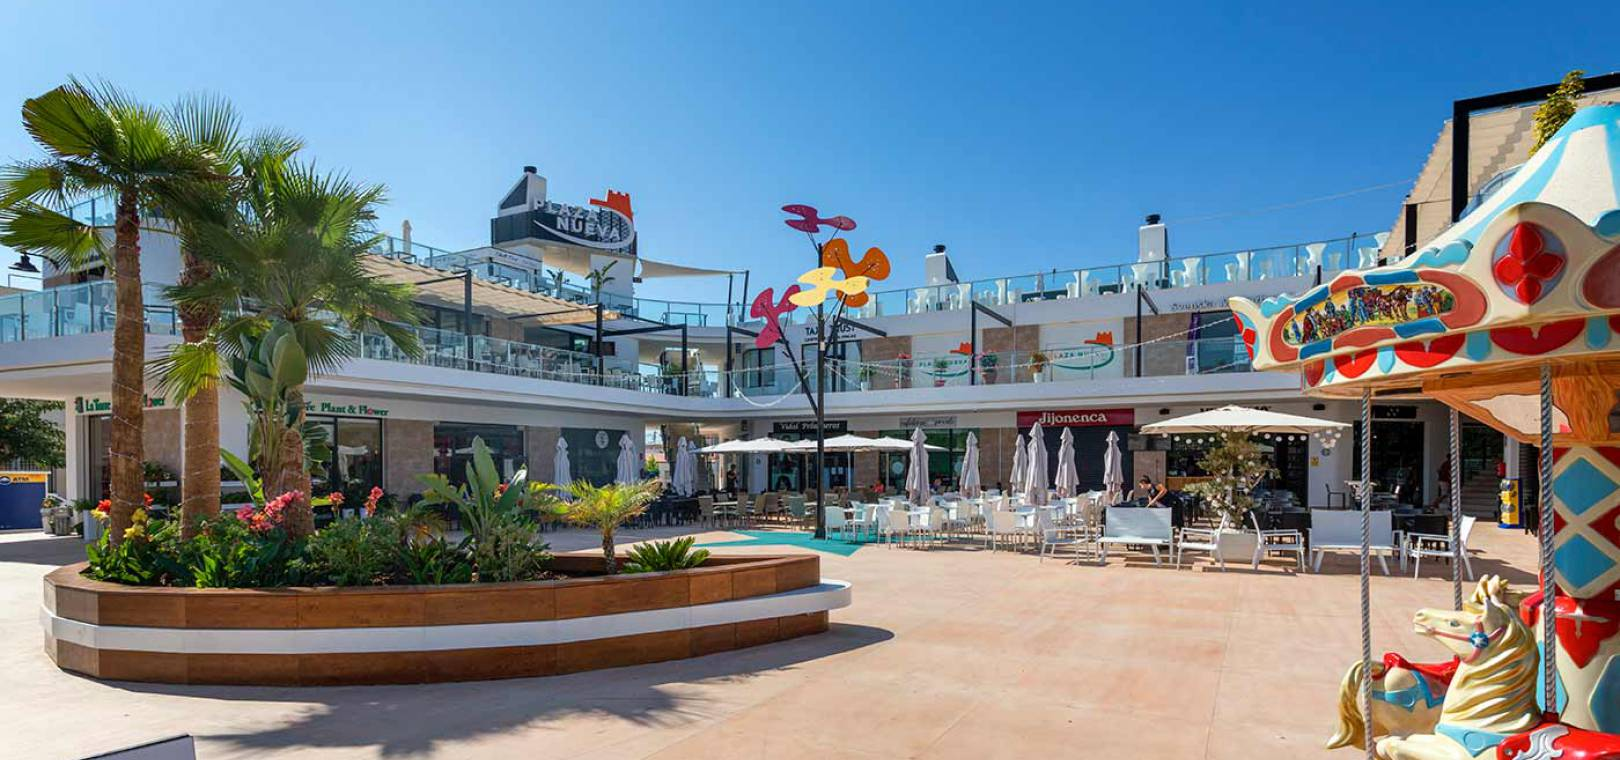 Torre_de_la_Horadada_New_Build_Luxury_Houses_For_Sale_nsp256_24